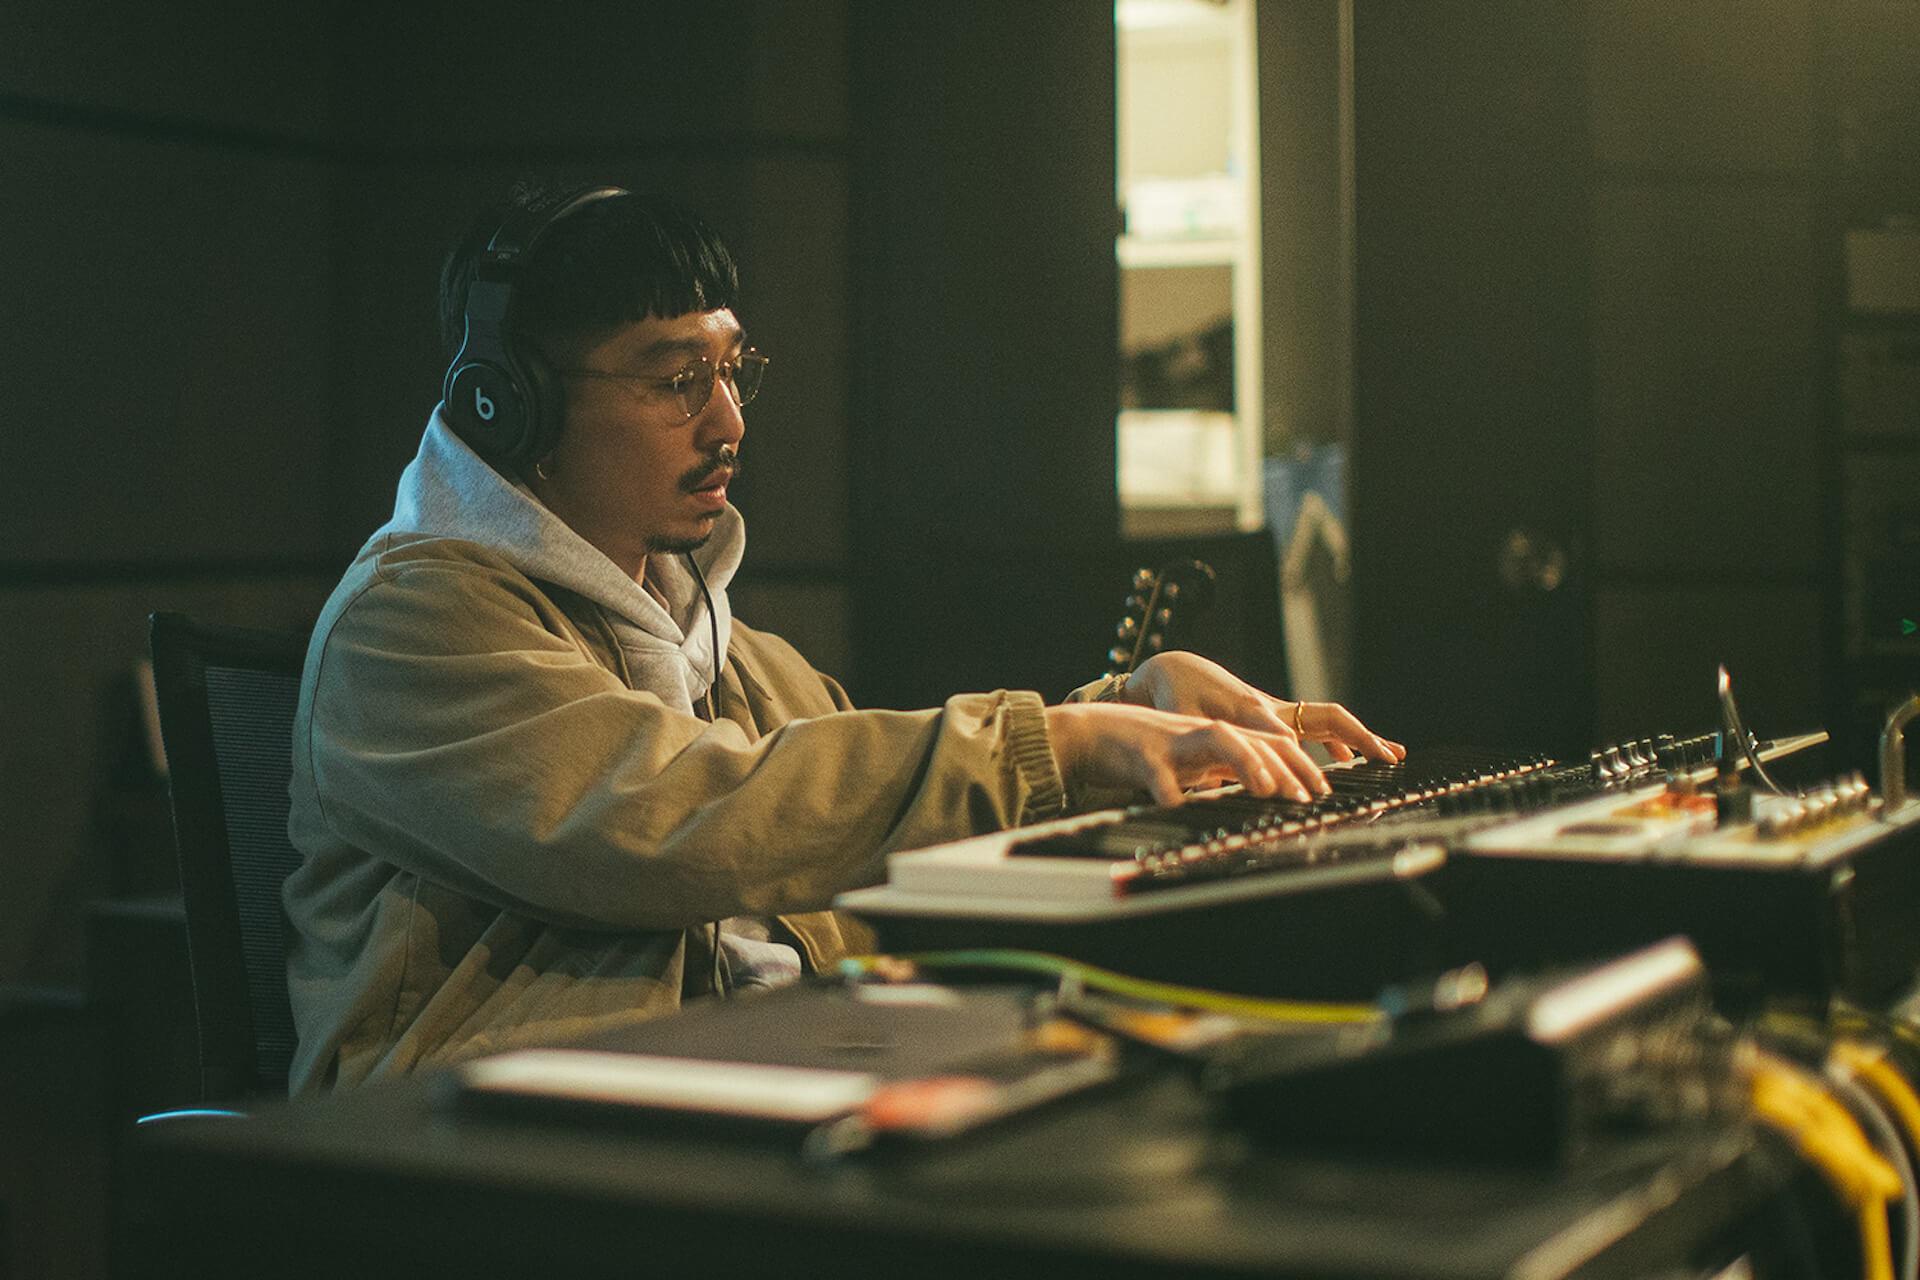 NulbarichがBeats by Dr. Dreの人気ドキュメンタリー「Beat x Beat」に登場!監督は木村太一 music210514_nulbarich_beats_6